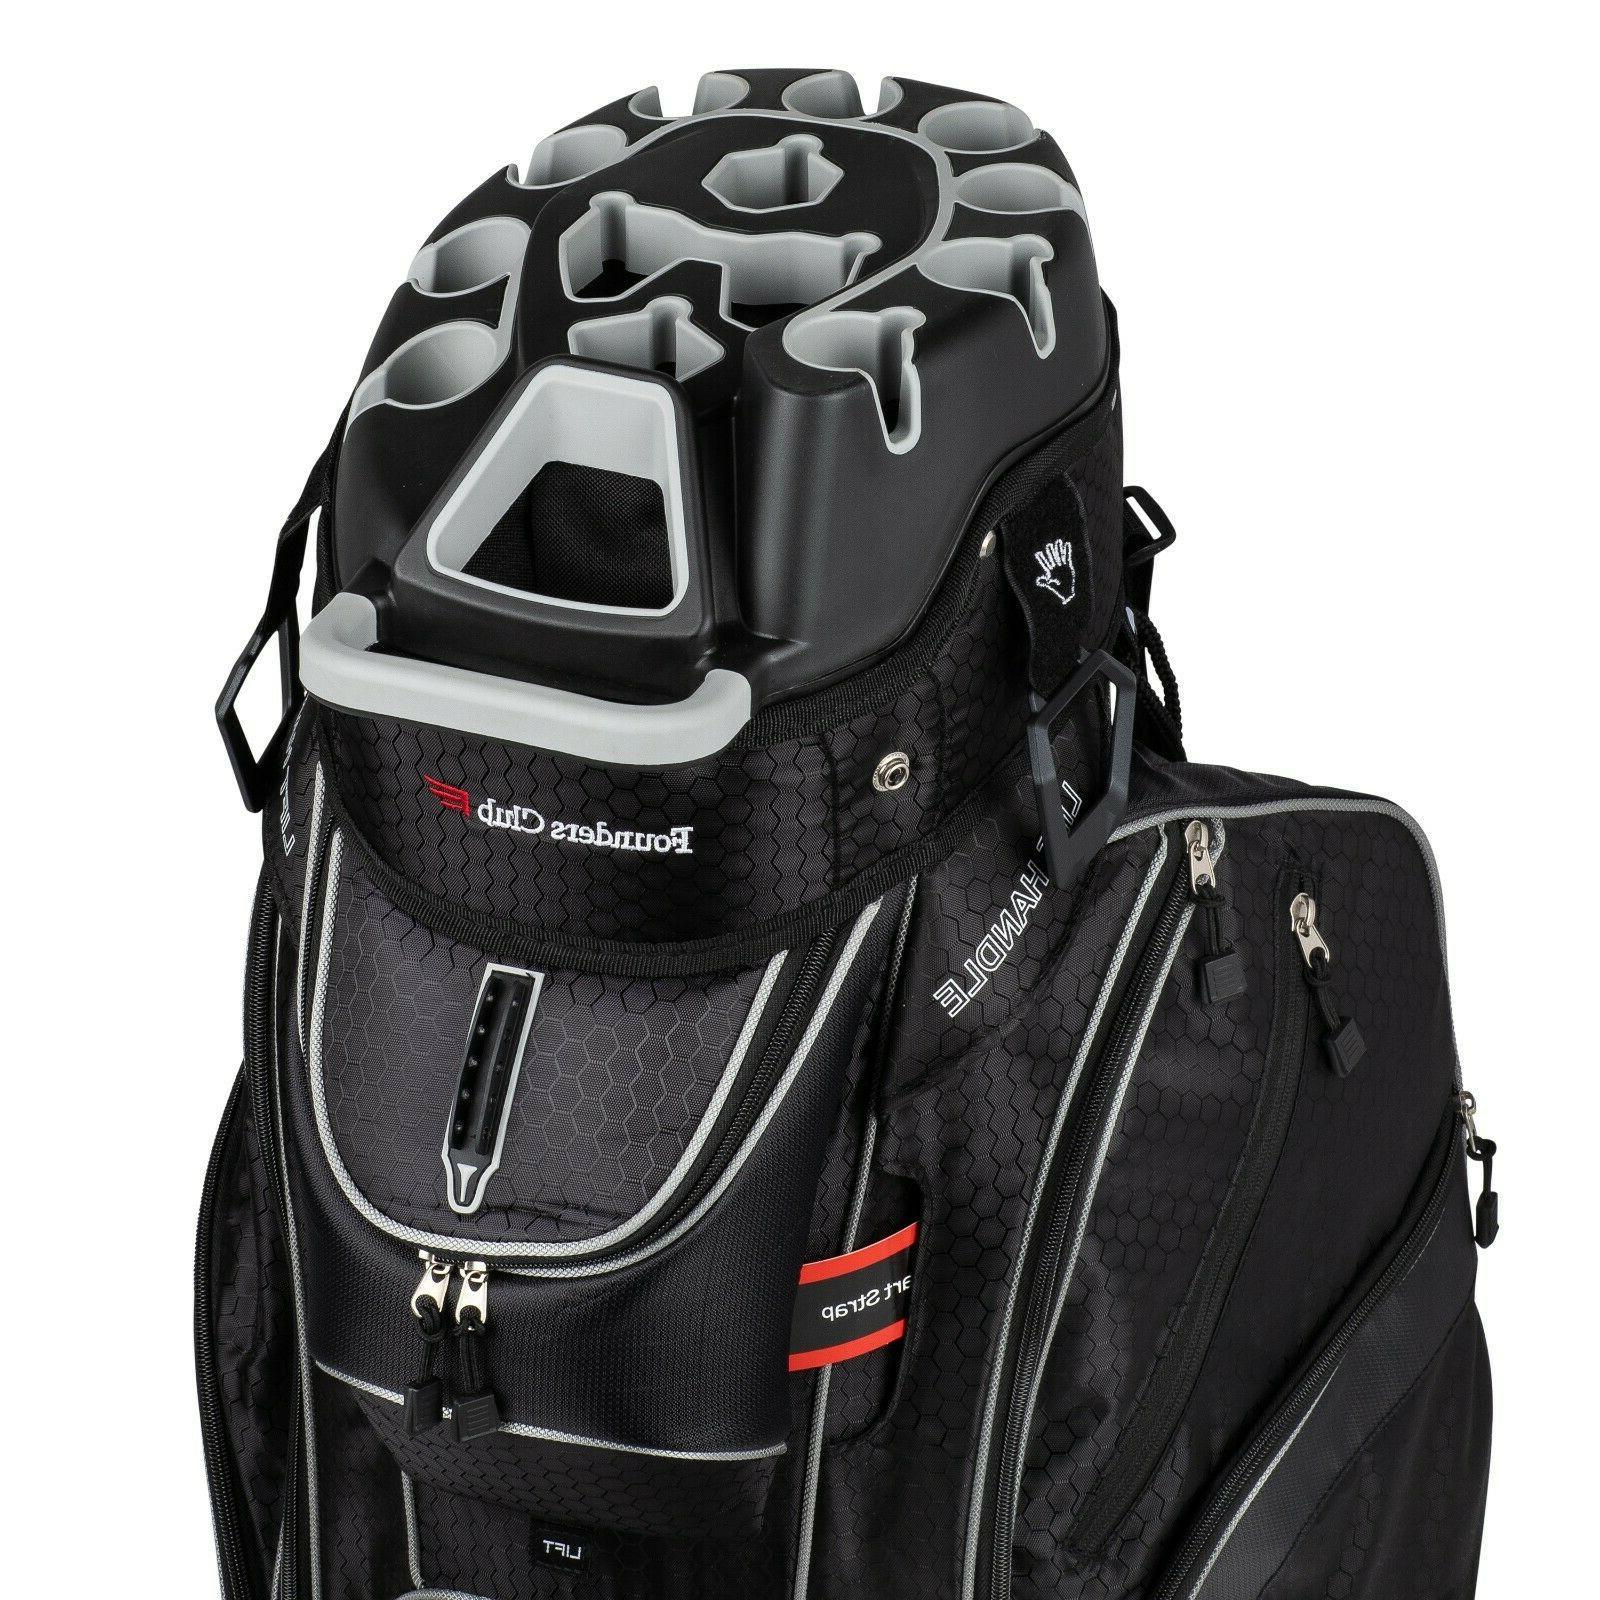 Founders Club Way Organizer Top Cart Bag